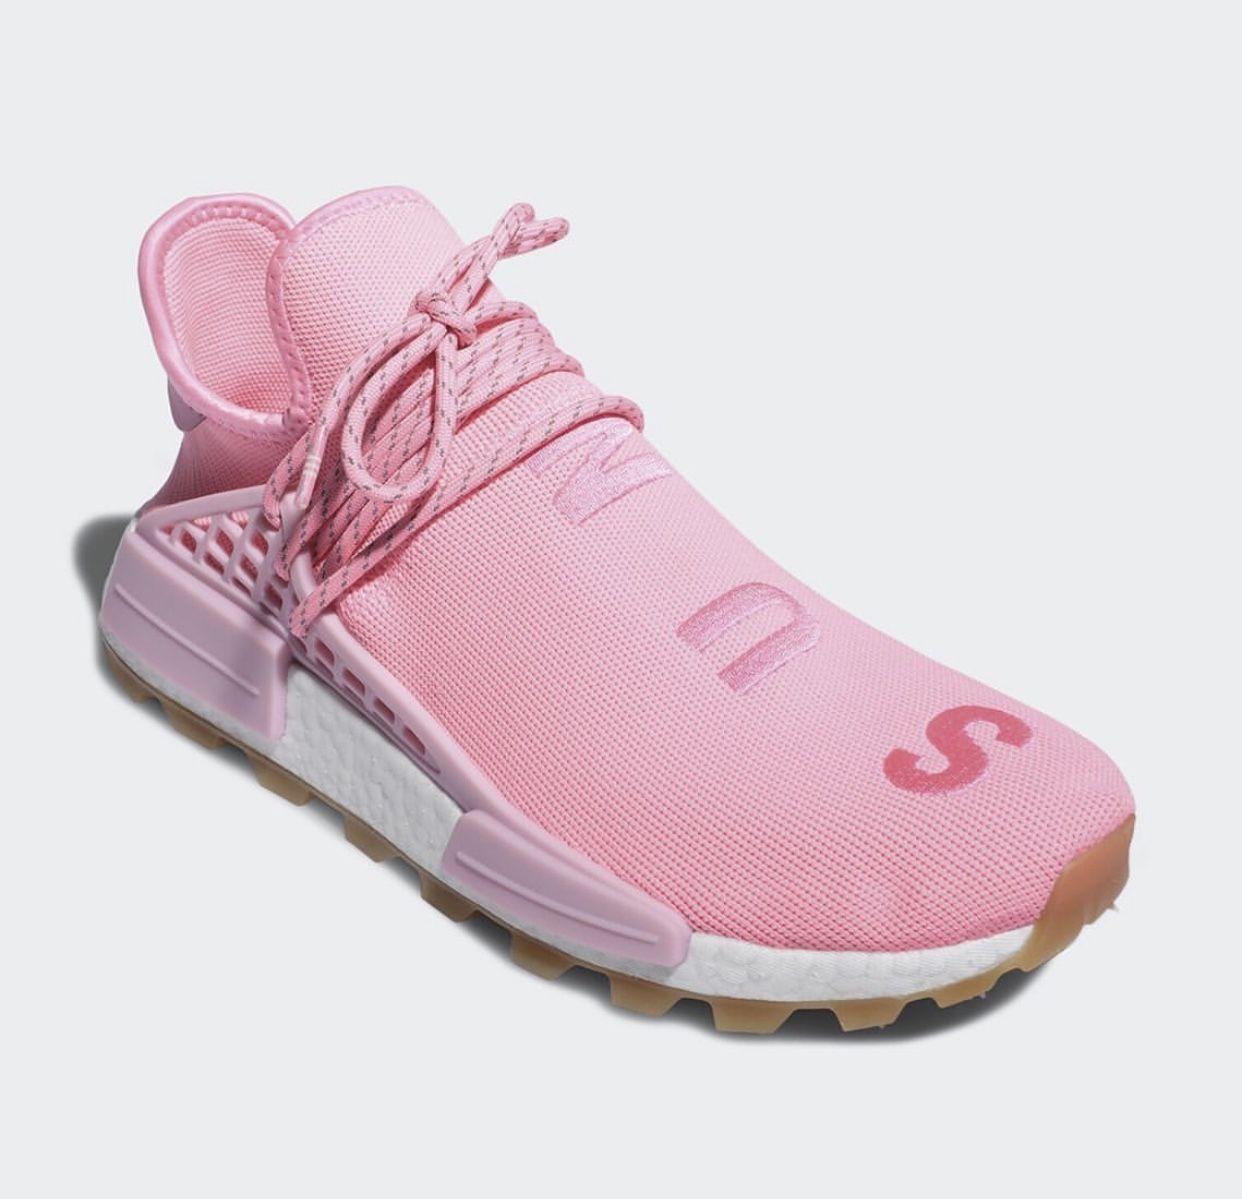 adidas nmd pink and bianca